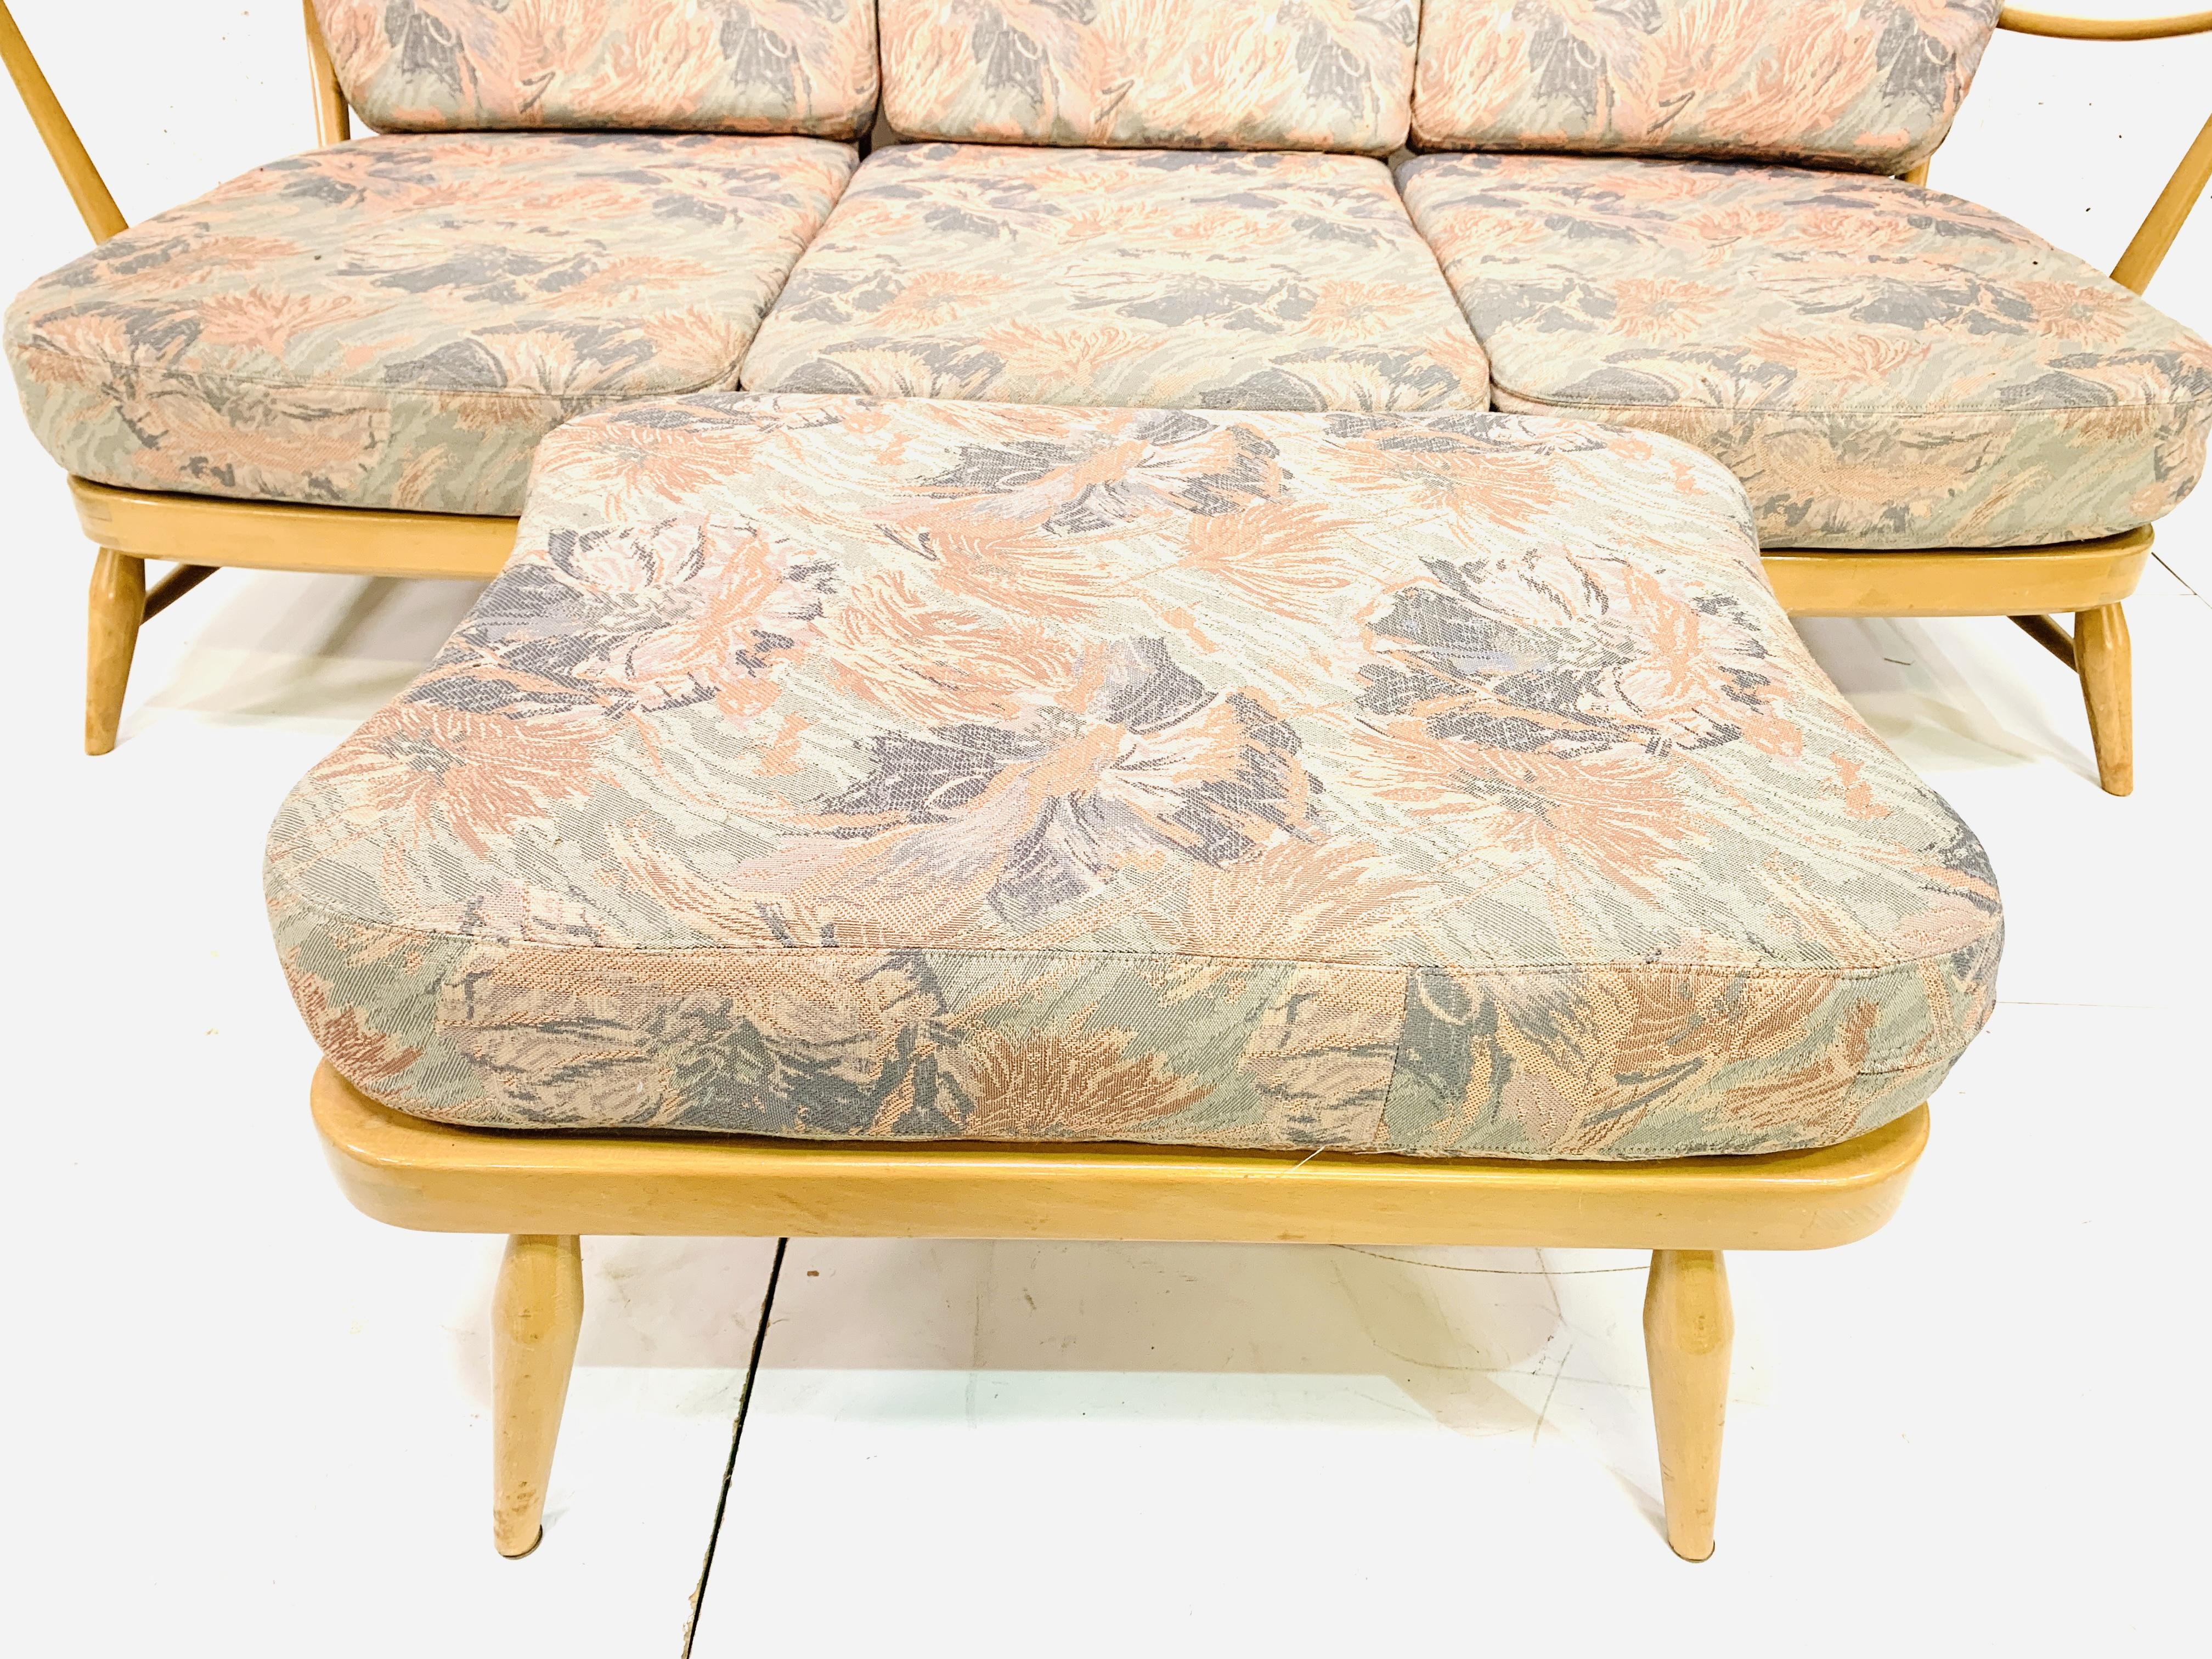 Ercol three seat sofa - Image 4 of 5